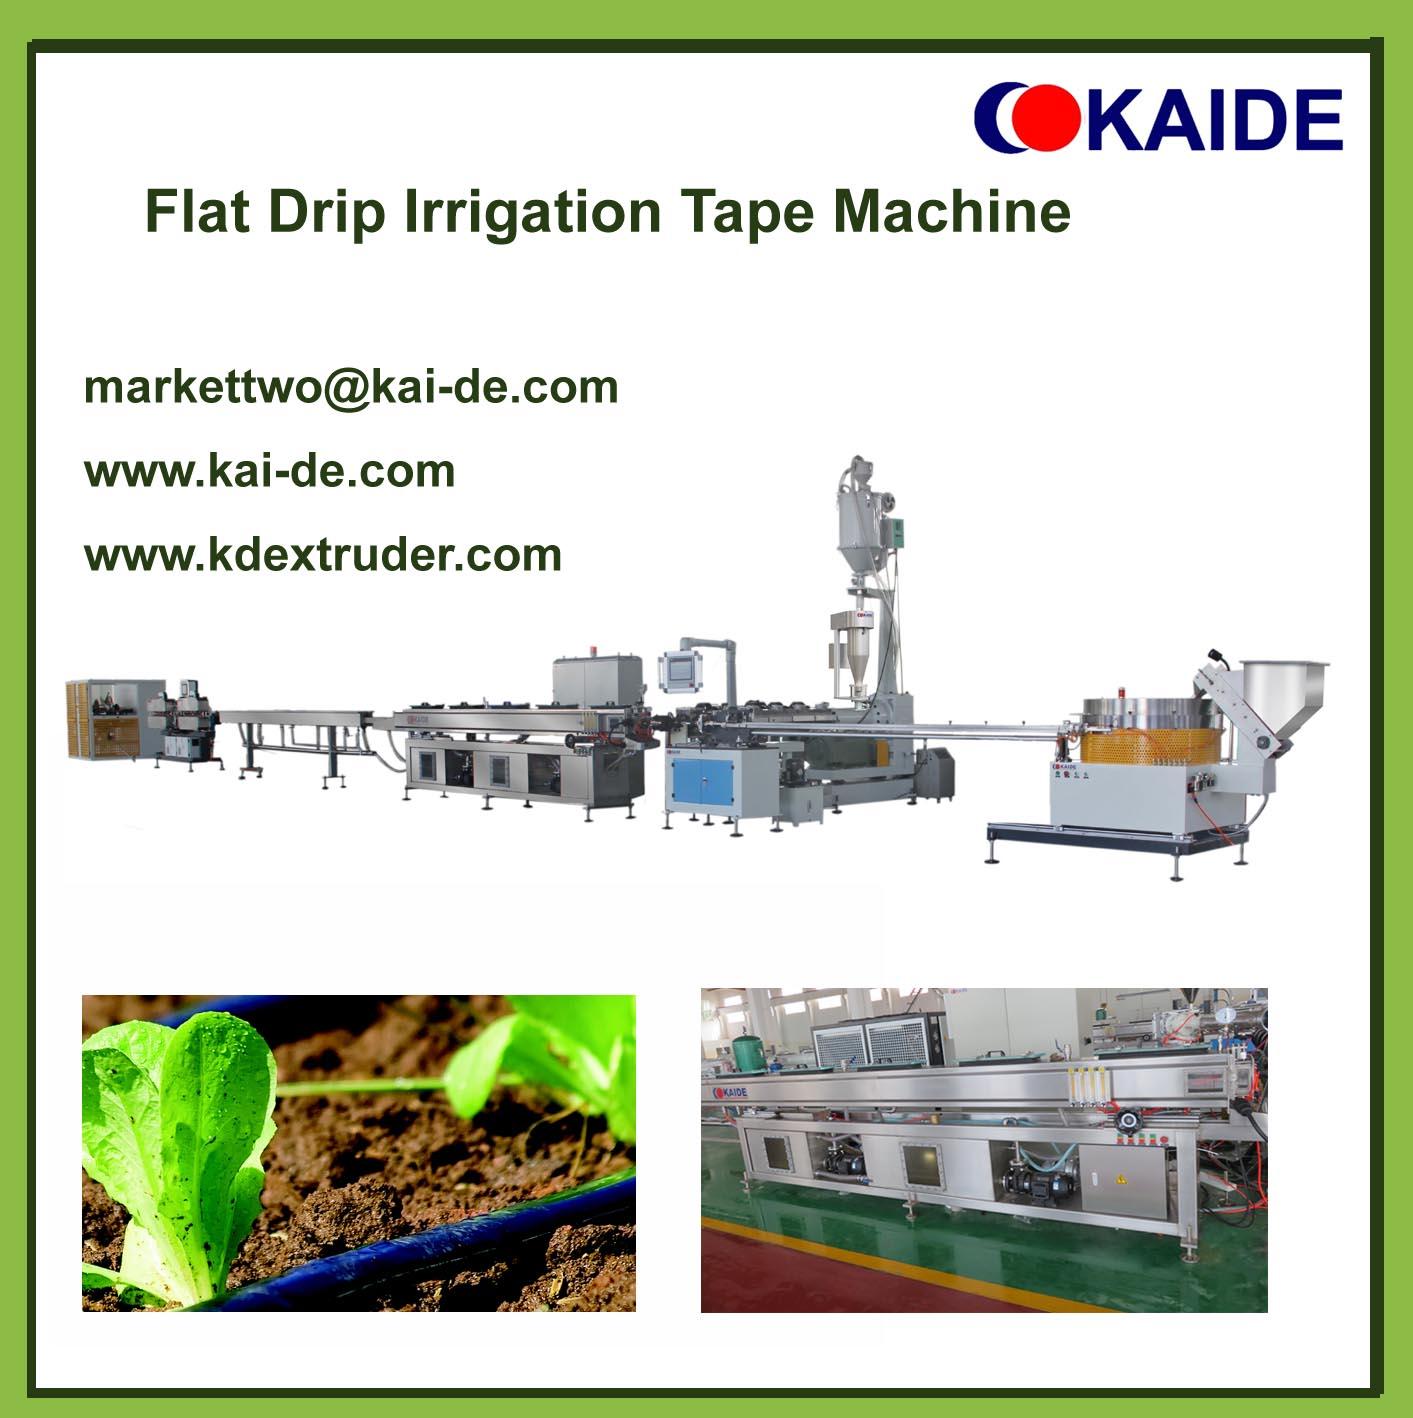 Flat Drip Irrigation Tape Production Machine 16mm